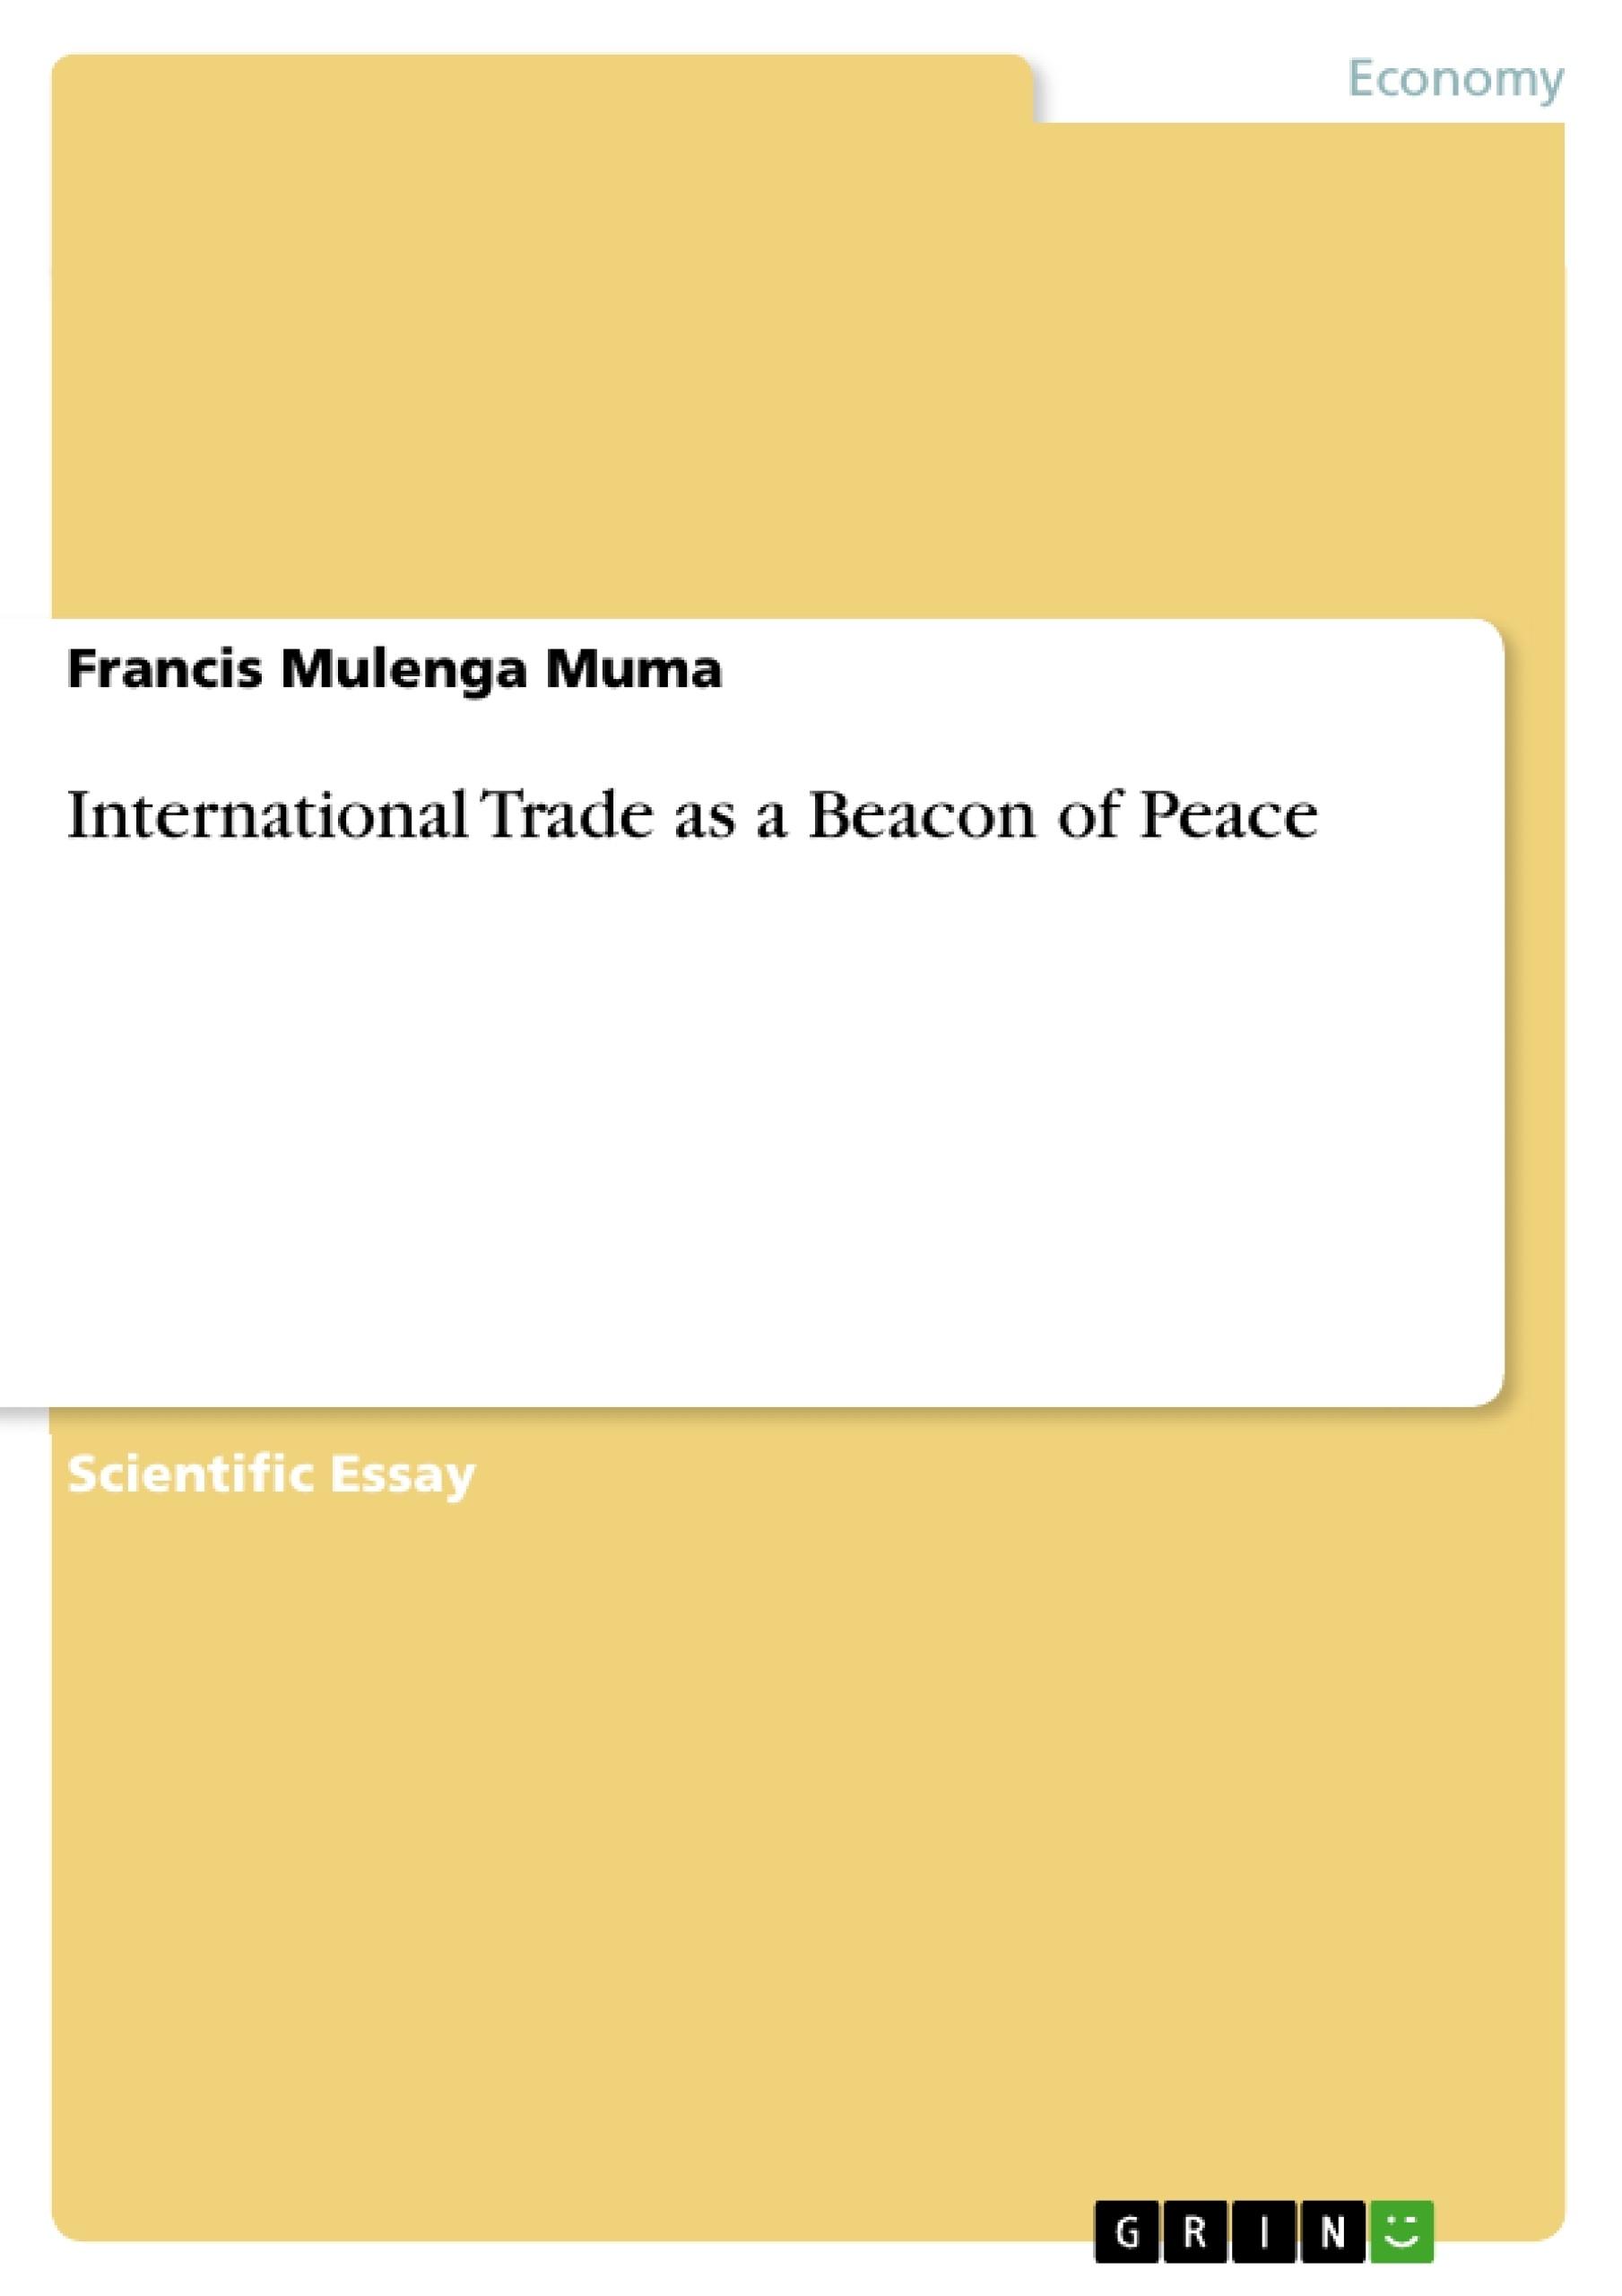 Title: International Trade as a Beacon of Peace